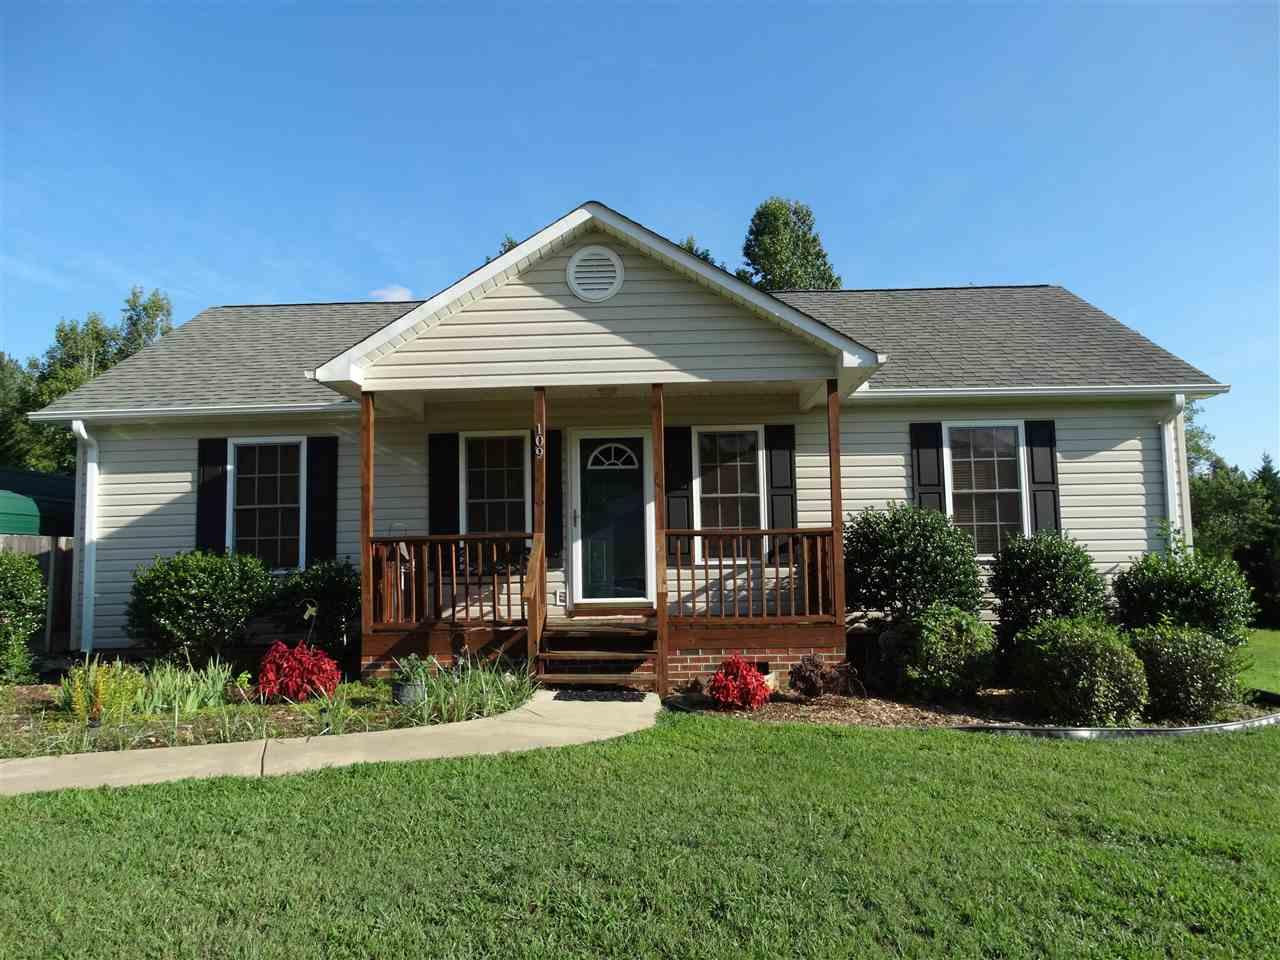 Real Estate for Sale, ListingId: 35023751, Pickens,SC29671